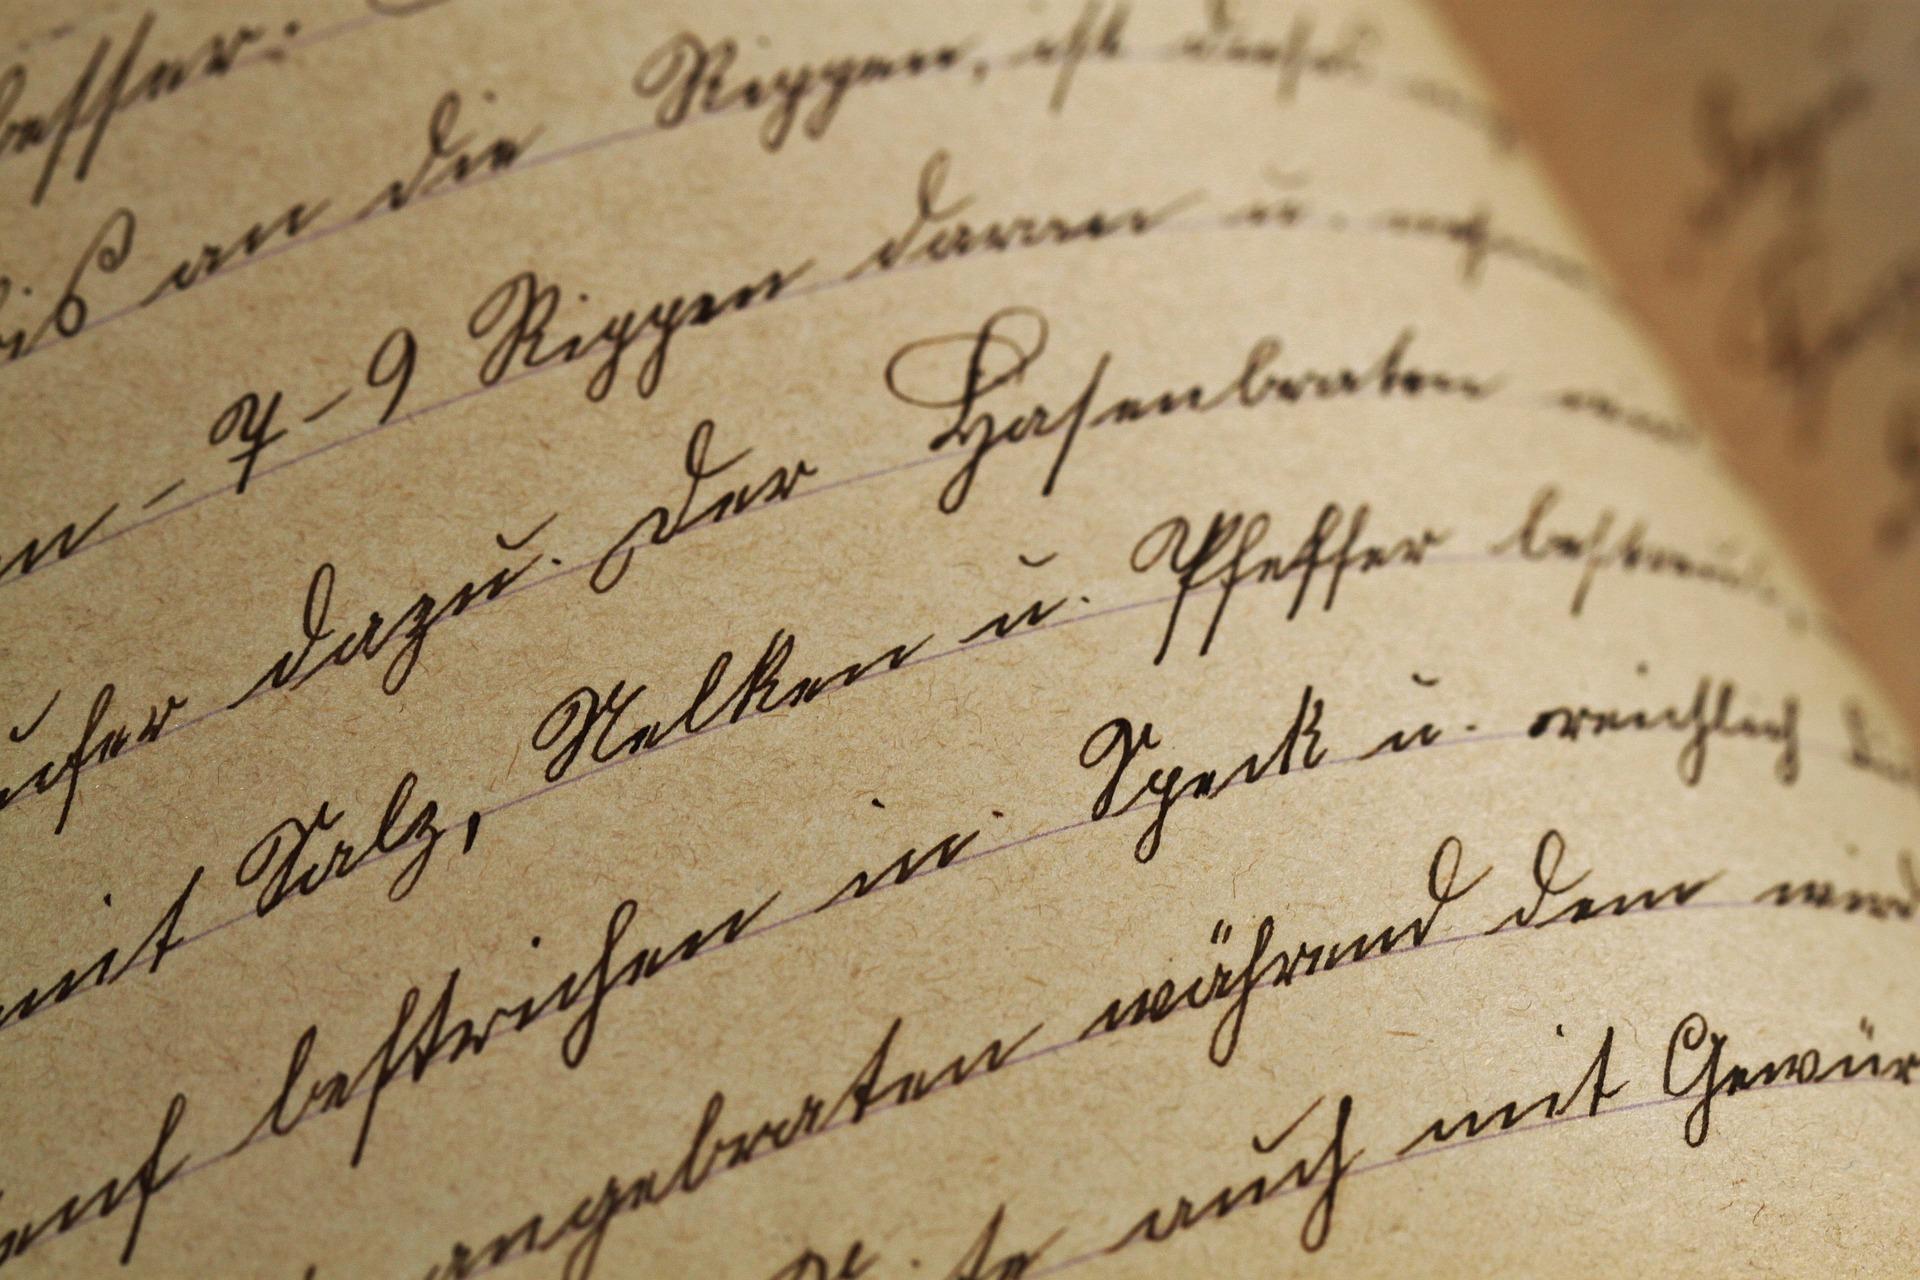 Schrift antik | pixabay.com CC0